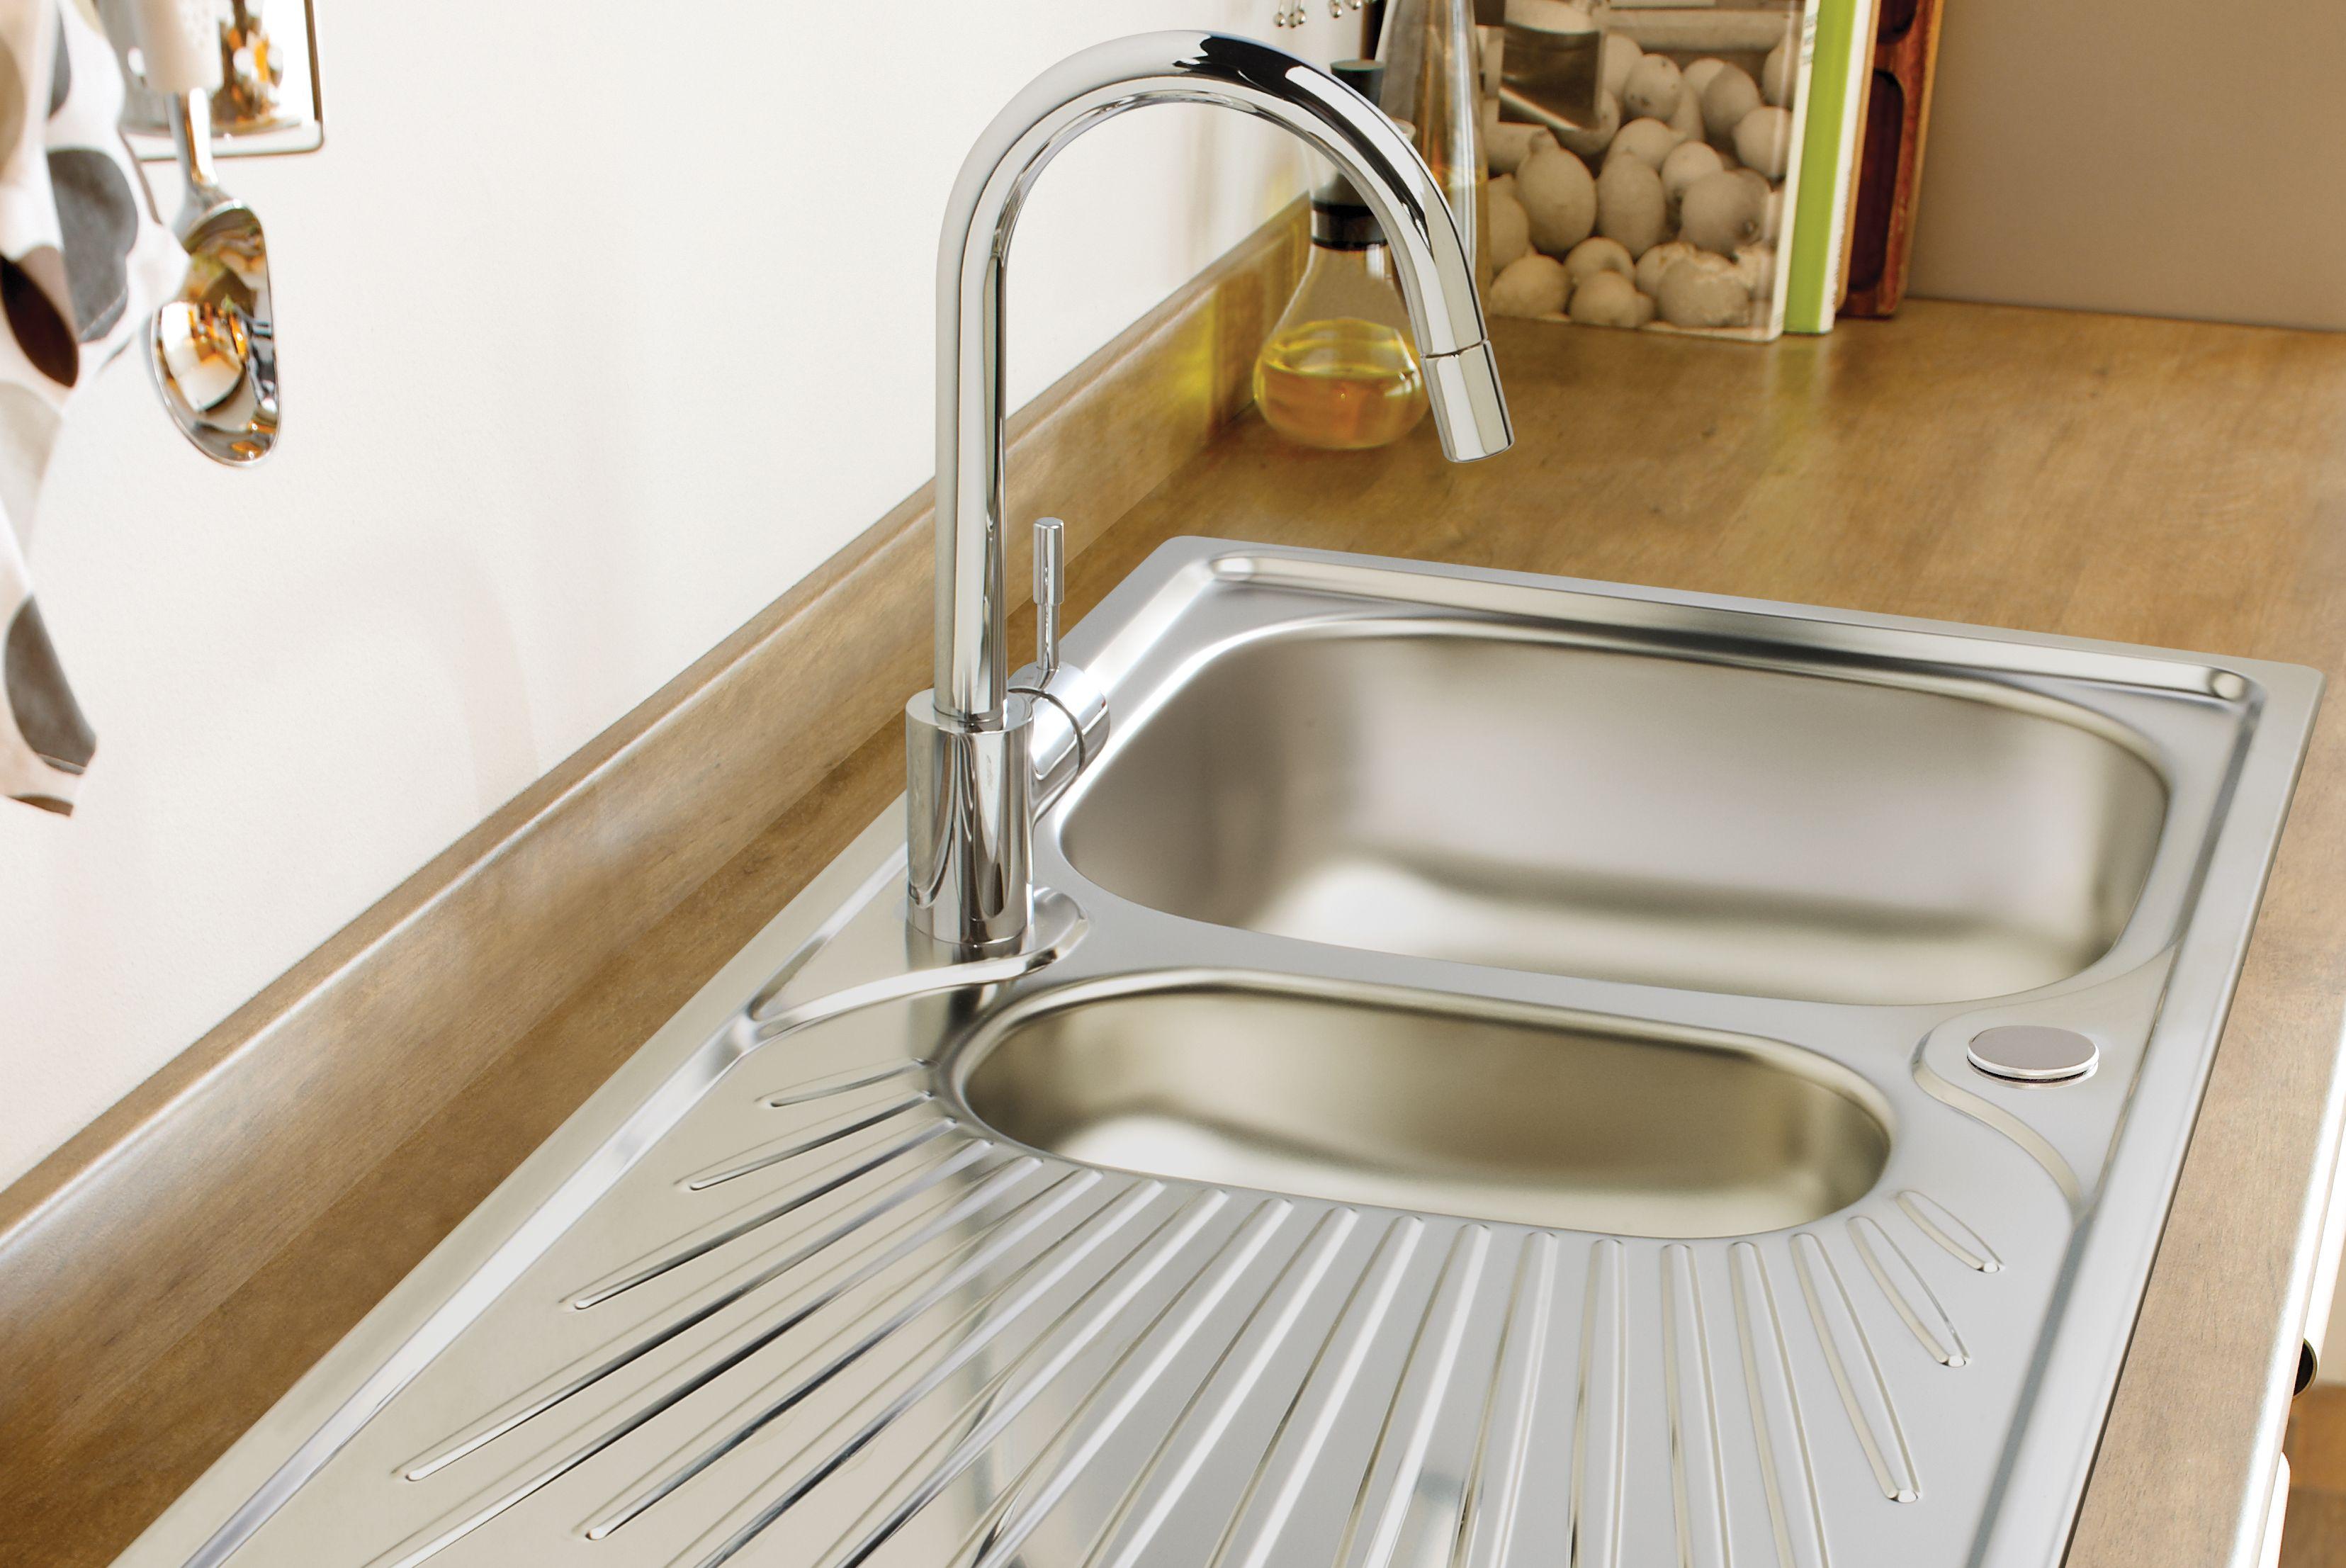 Bathroom Sinks B&Q Ireland videos | planning your dream kitchen with b&q | diy at b&q